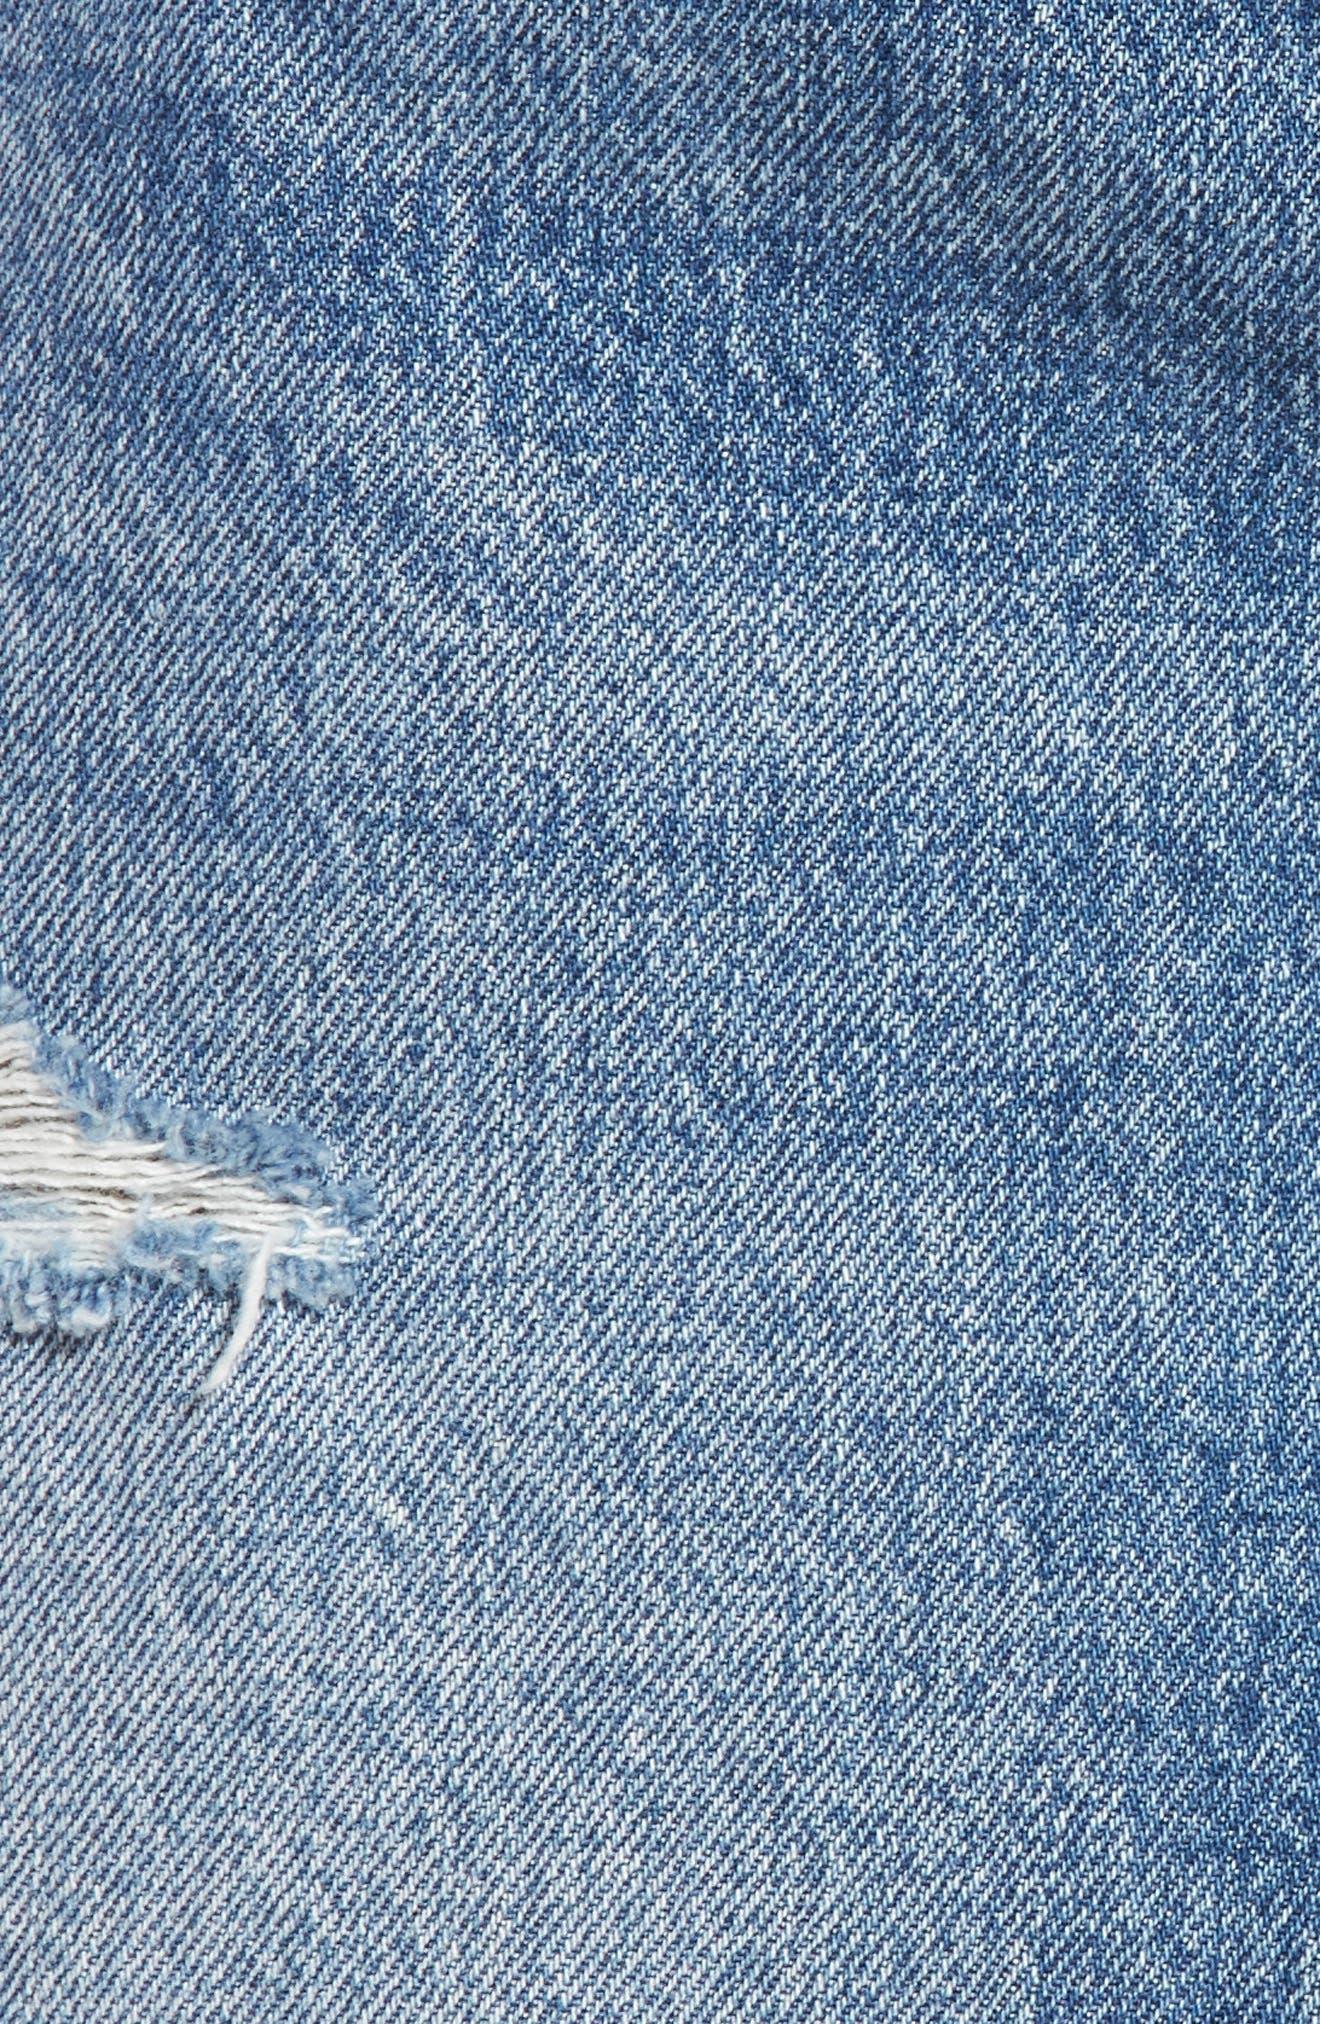 Distressed Denim Skirt,                             Alternate thumbnail 5, color,